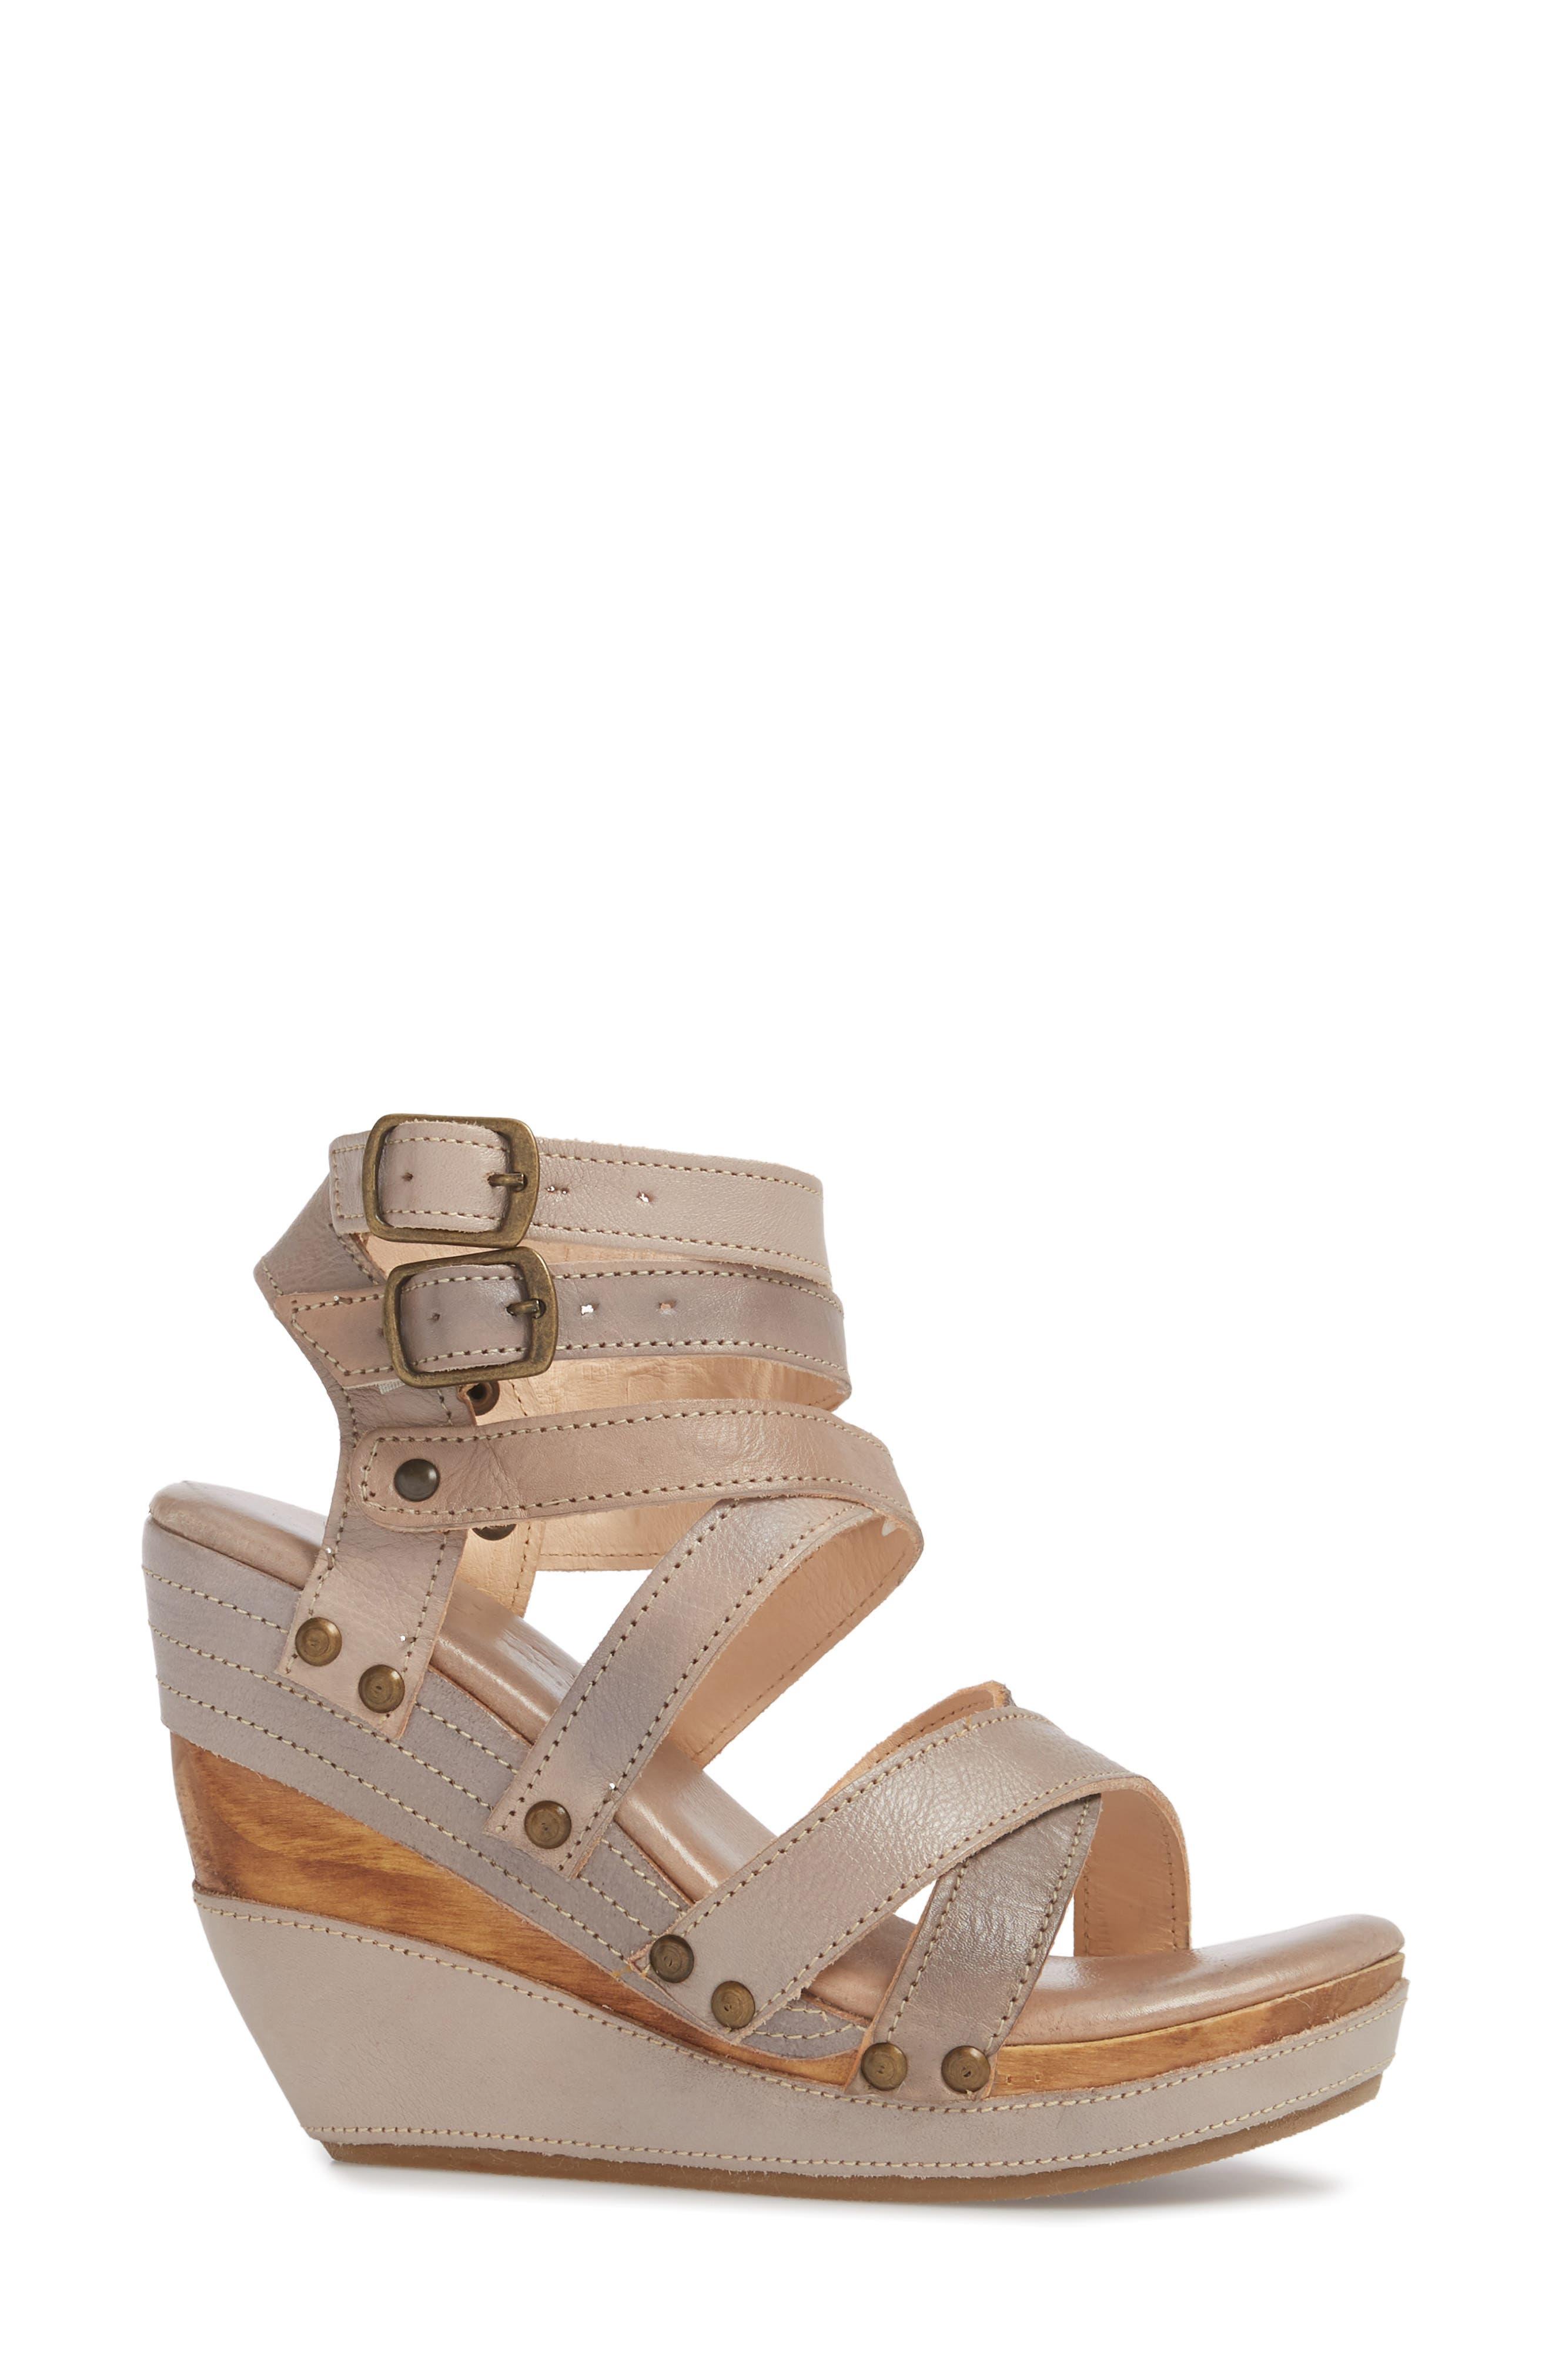 'Juliana' Sandal,                             Alternate thumbnail 3, color,                             Light Grey Leather